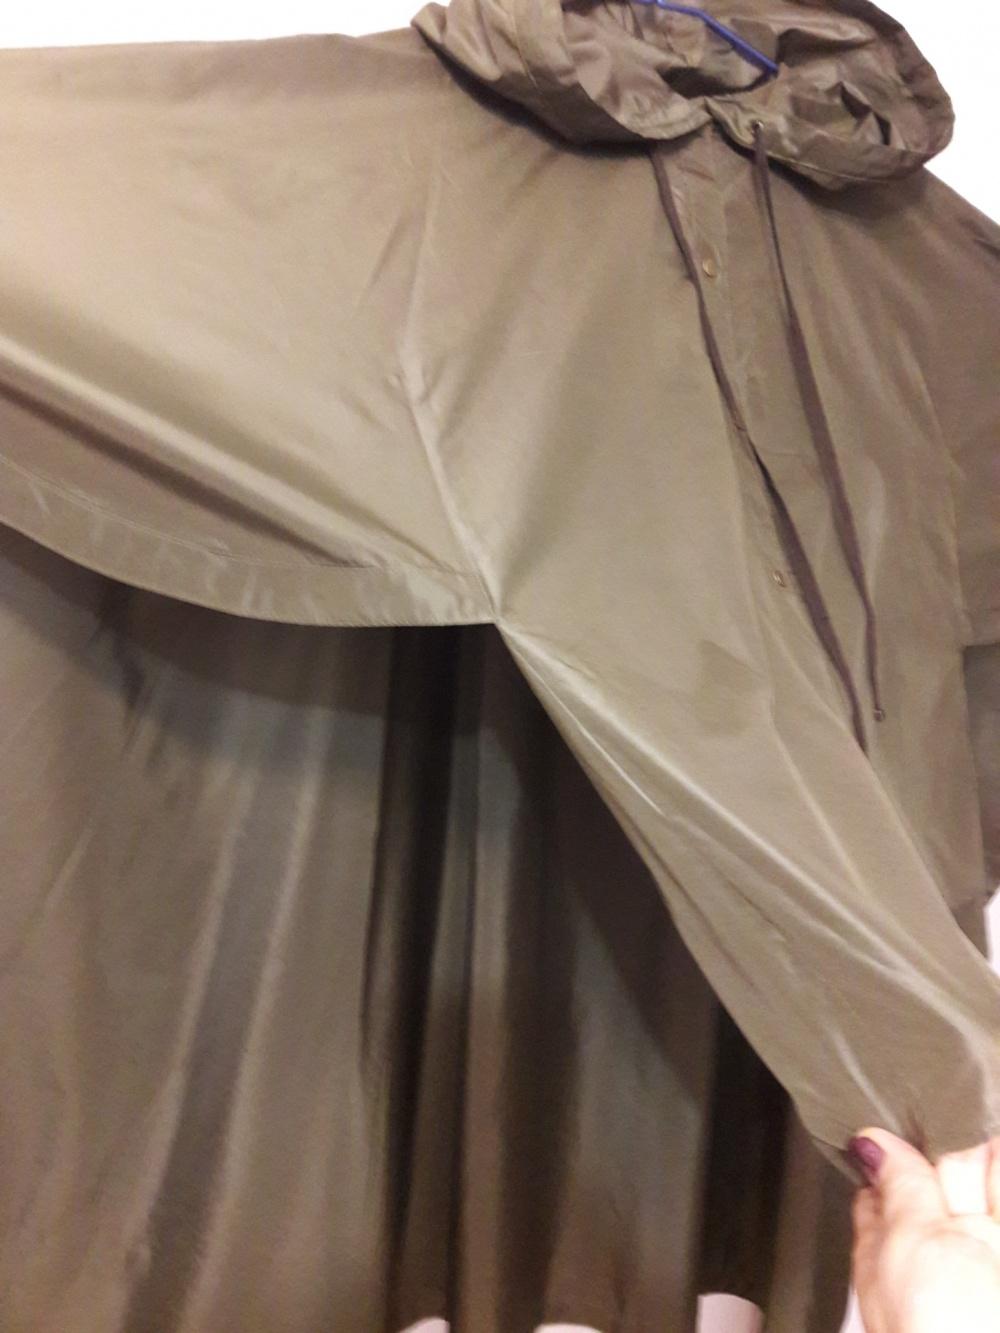 Шелковый плащ-накидка Kenzo, р-р S-M